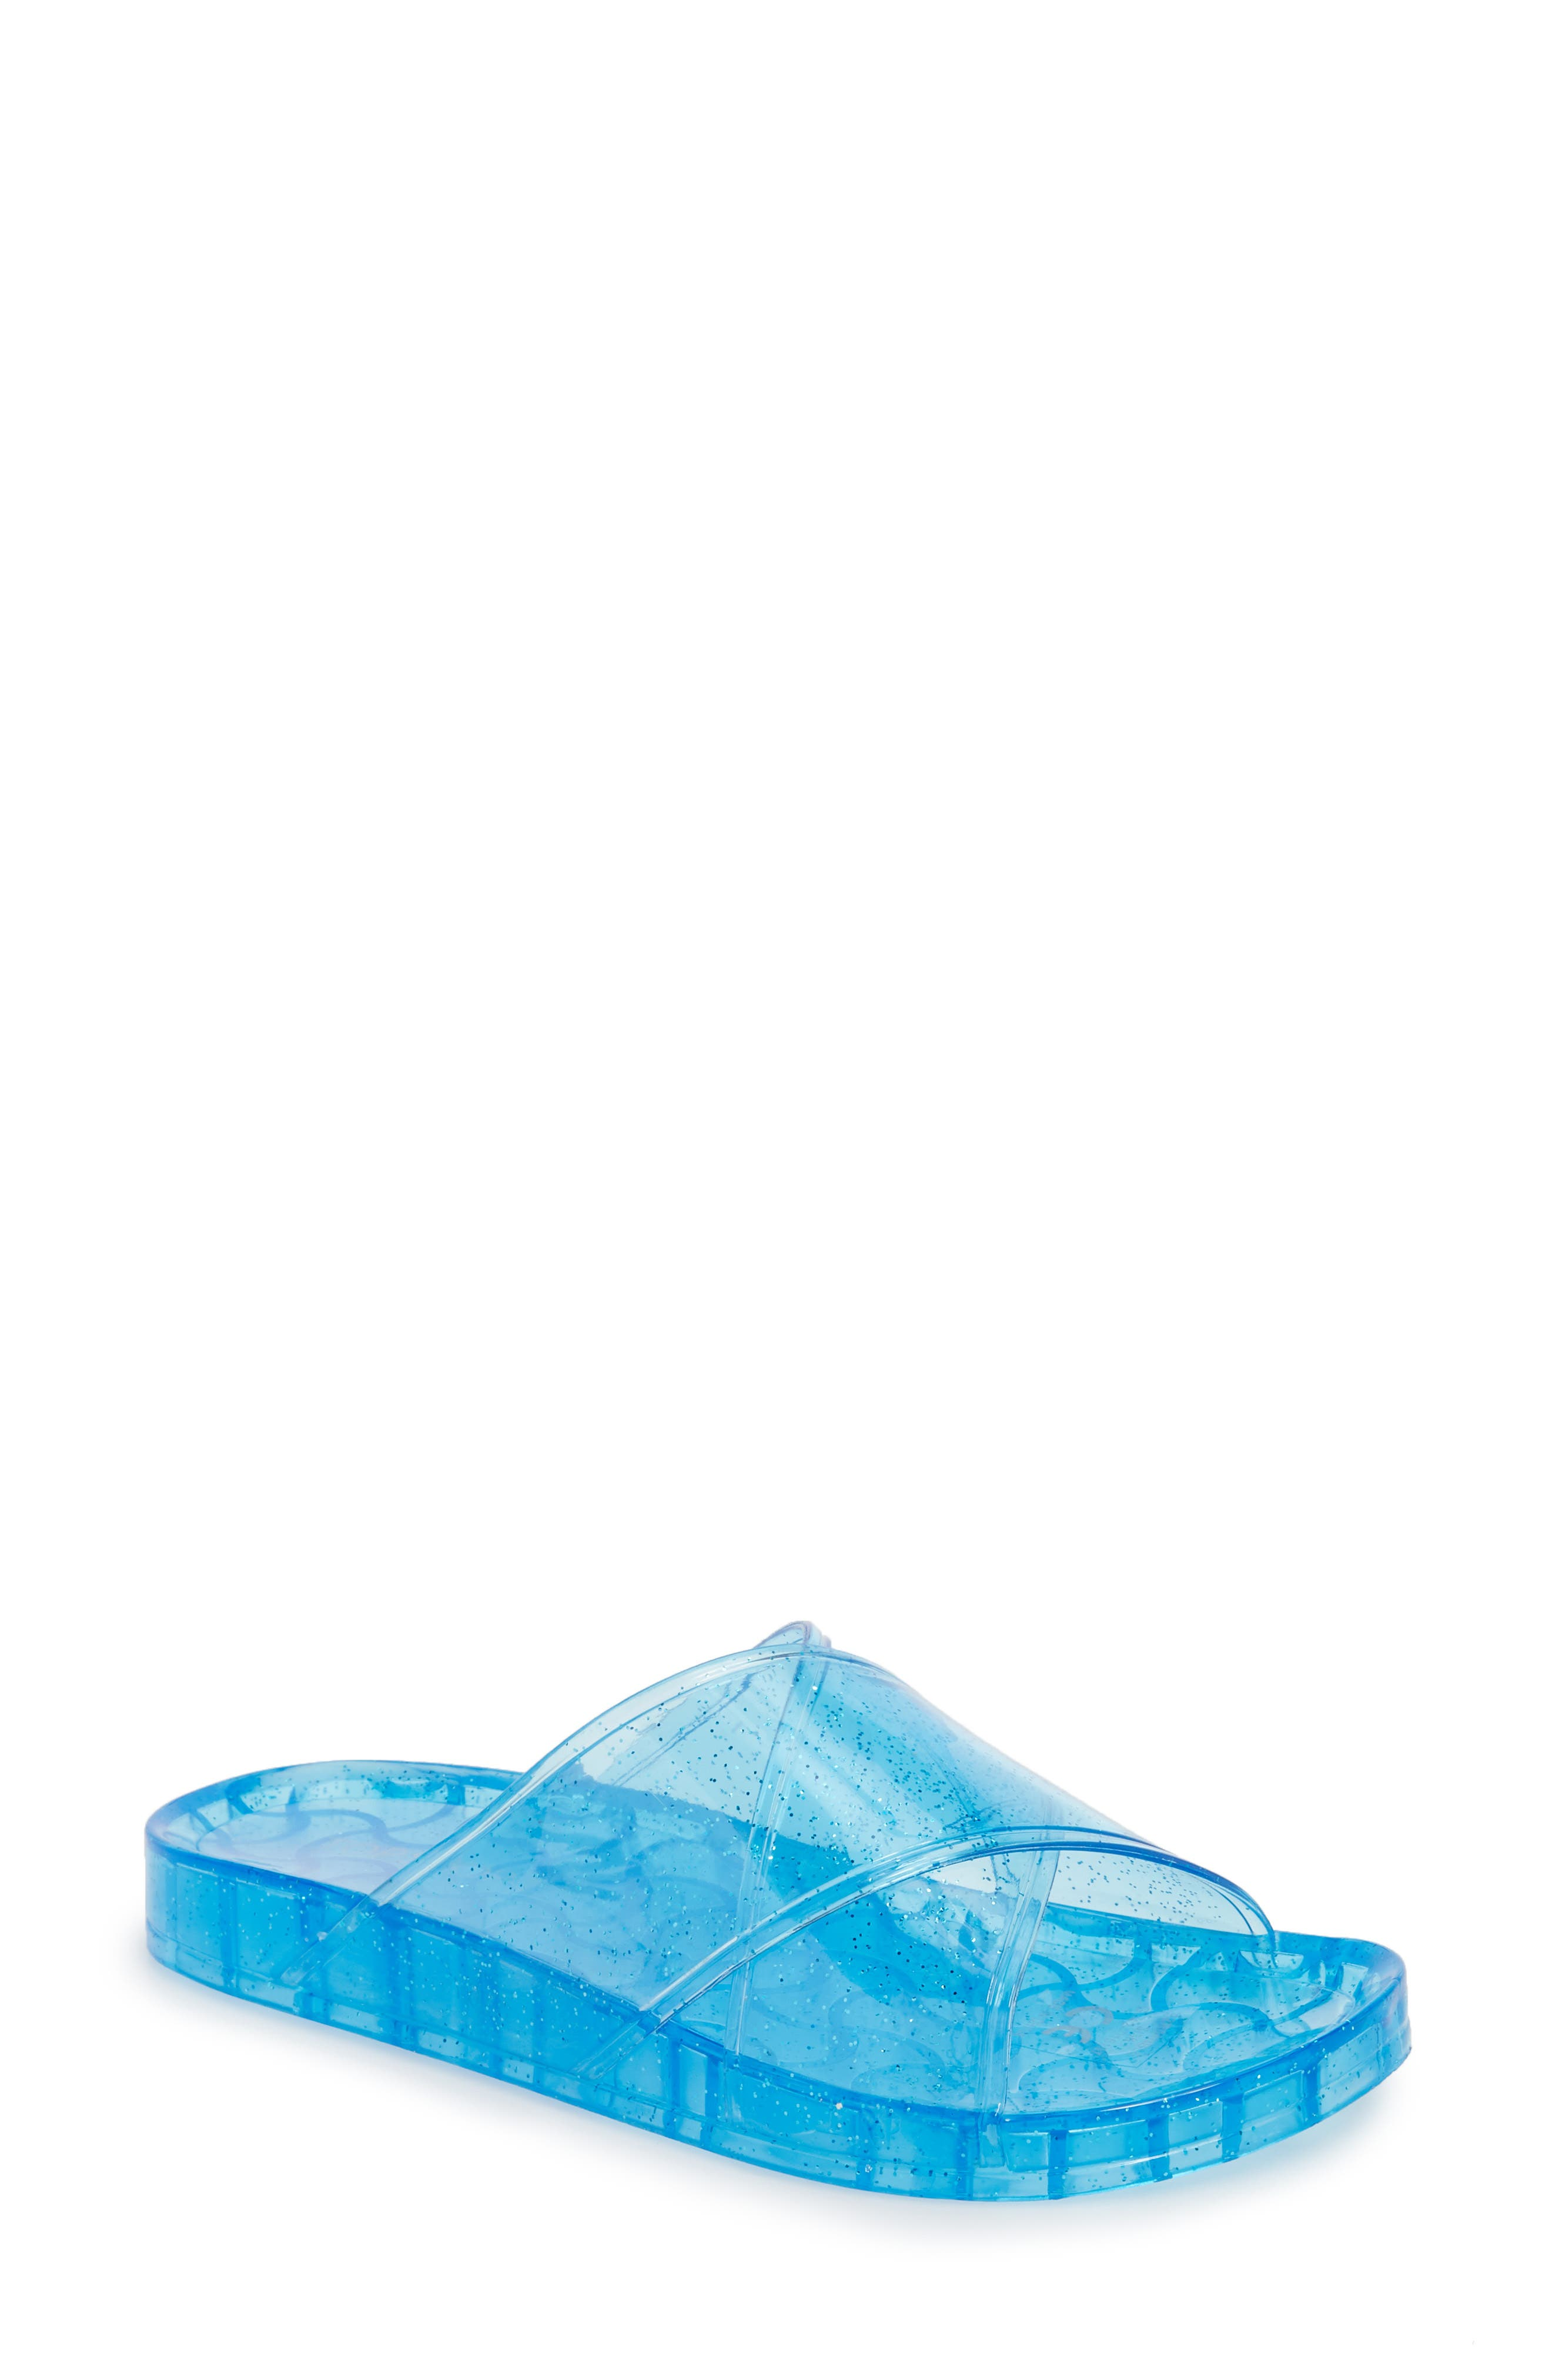 Roxy Jelly Slide Sandal,                         Main,                         color, Blue